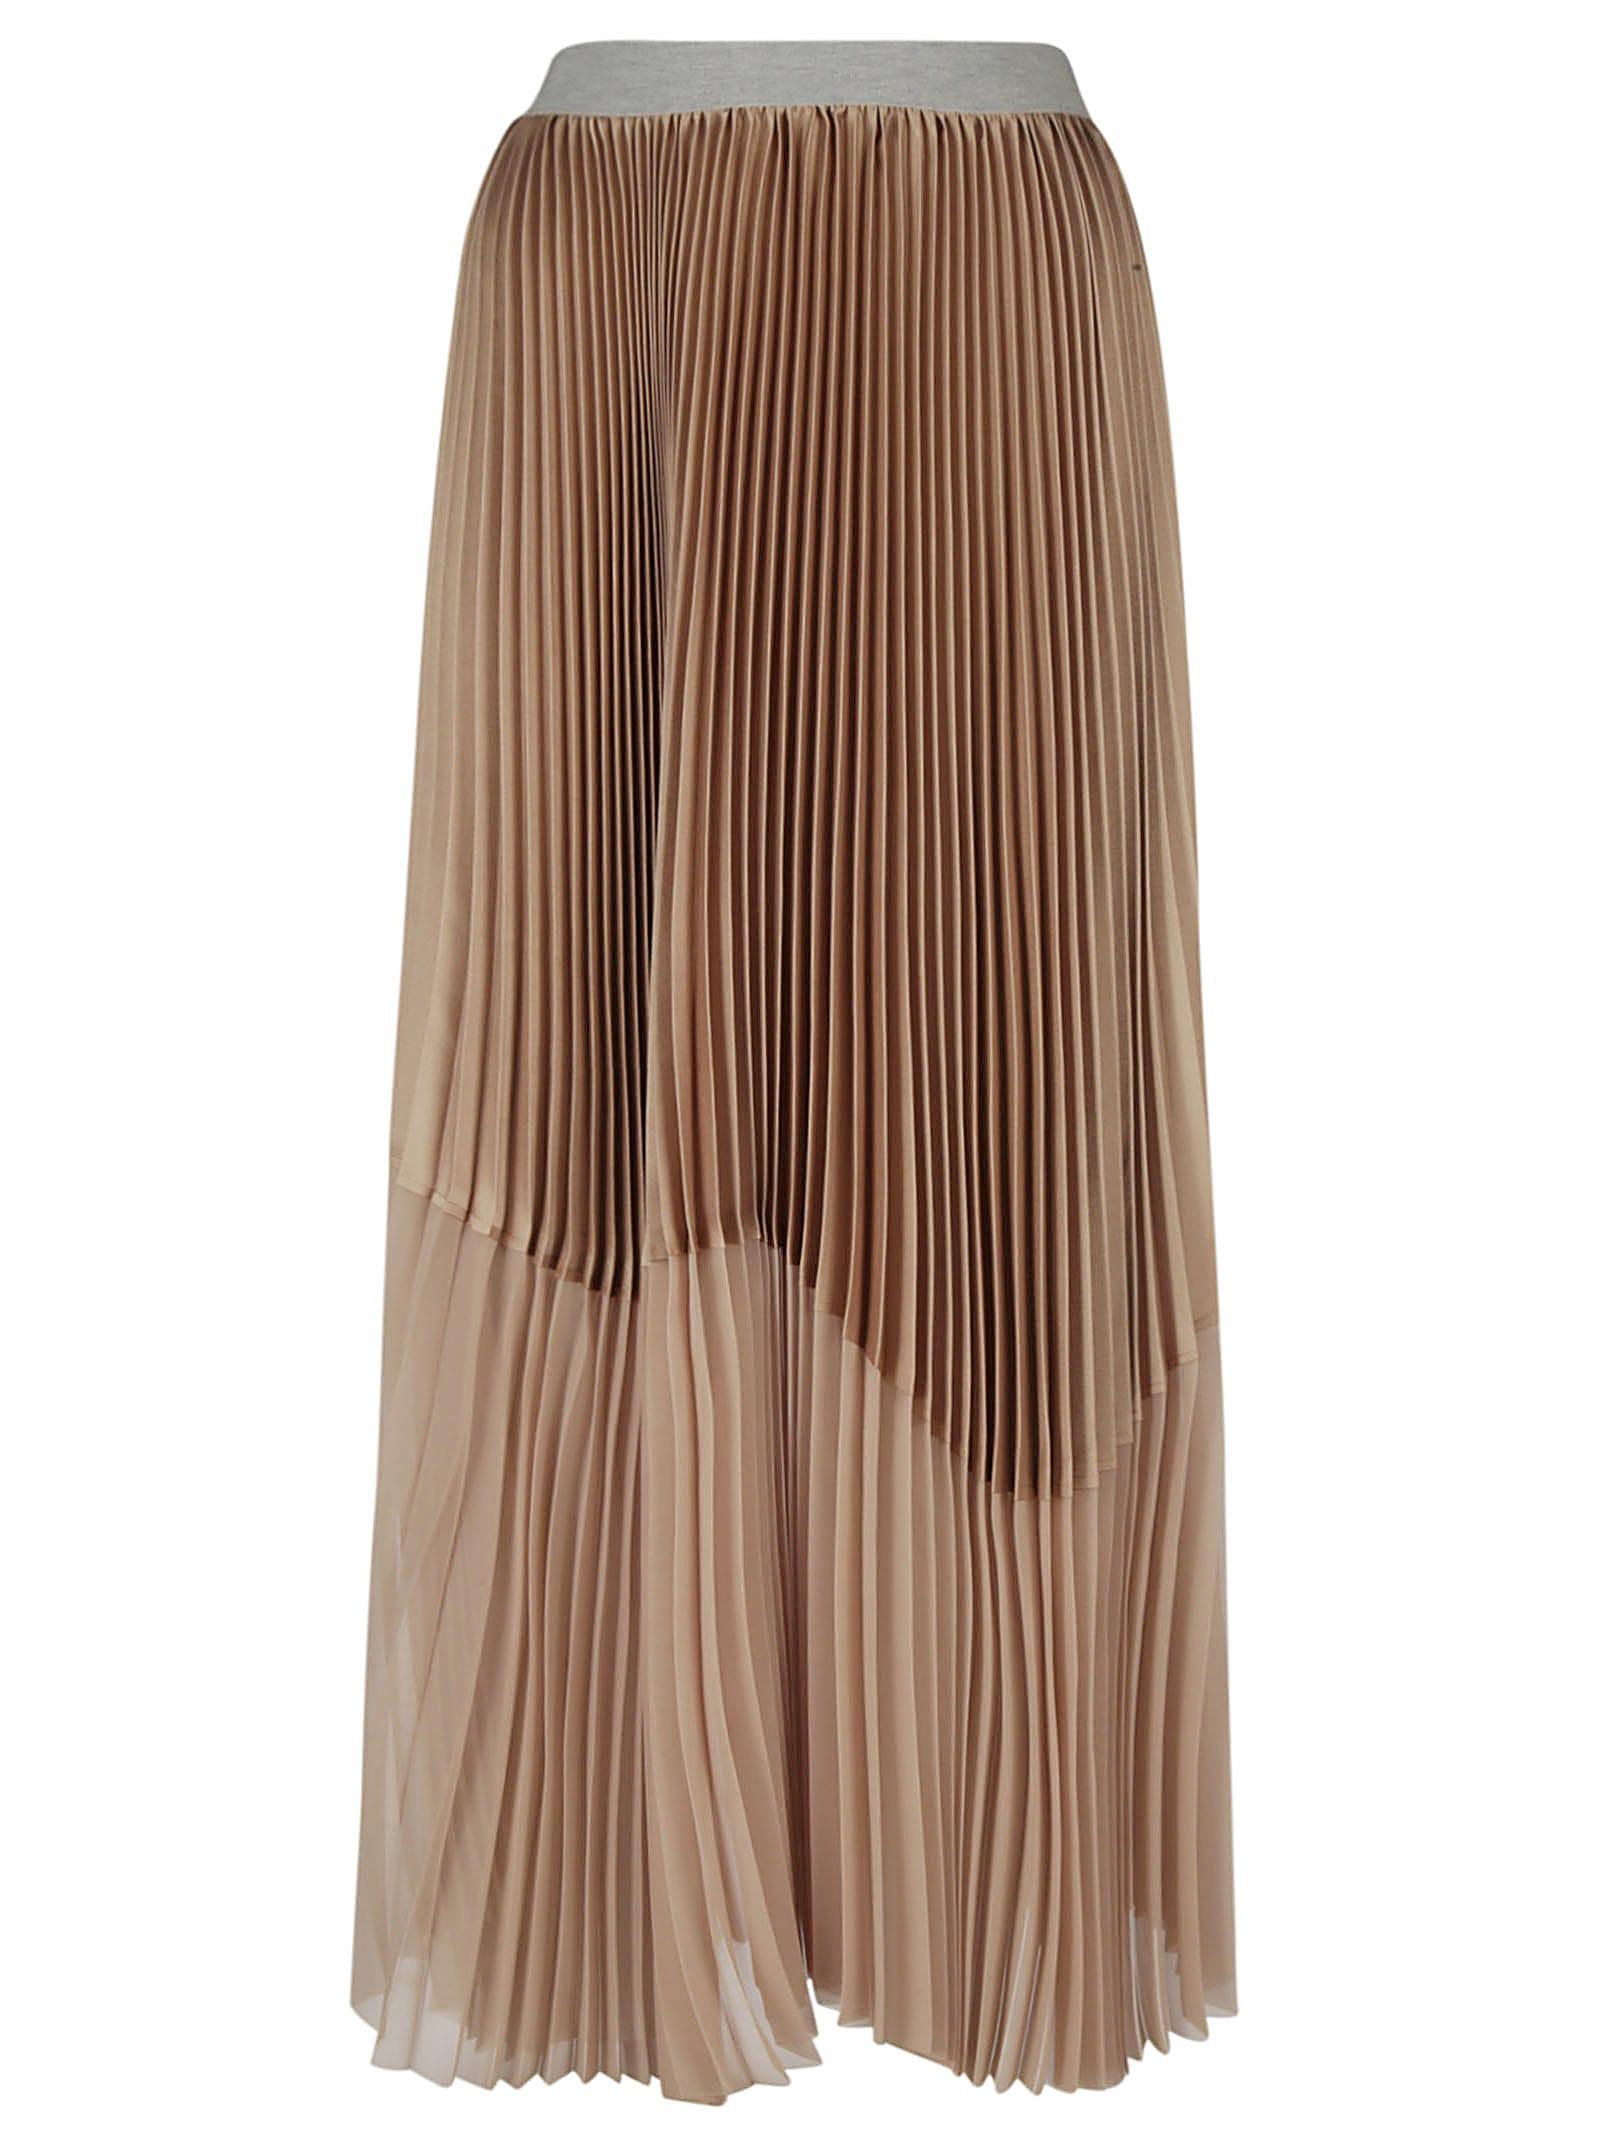 Fabiana Filippi Asymmetric Plisse Pleated Skirt